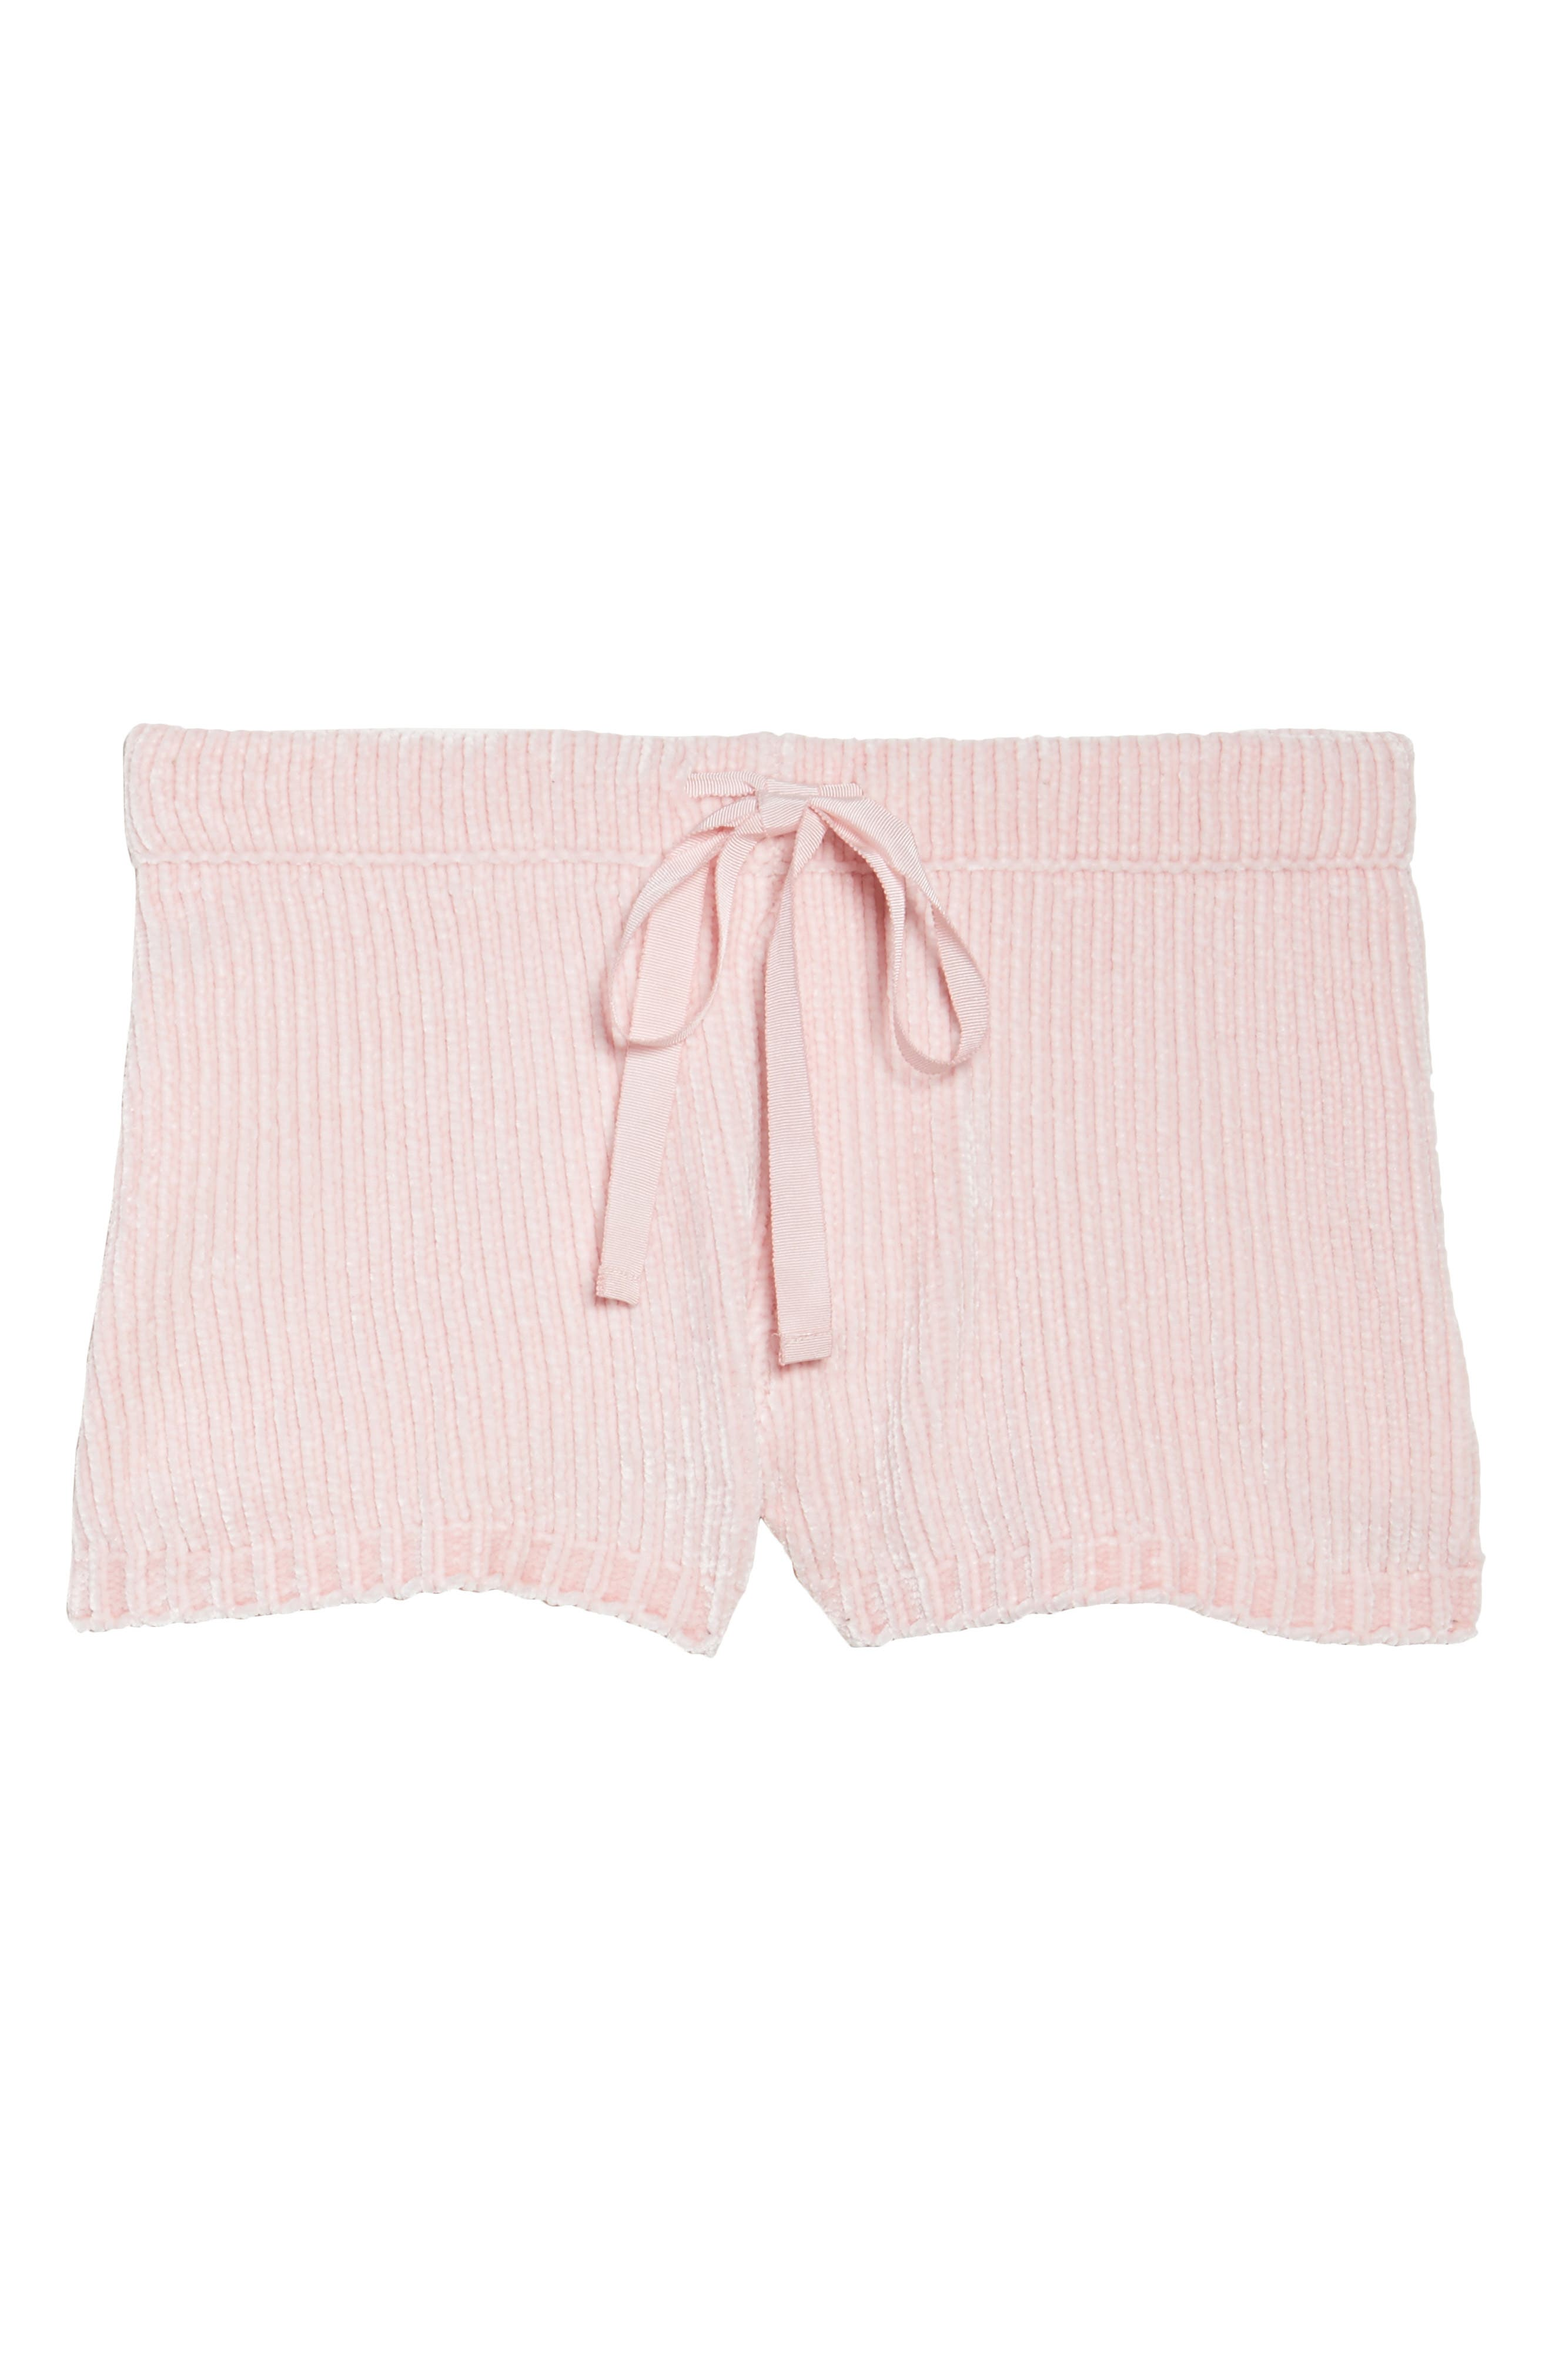 Chenille Shorts,                             Alternate thumbnail 12, color,